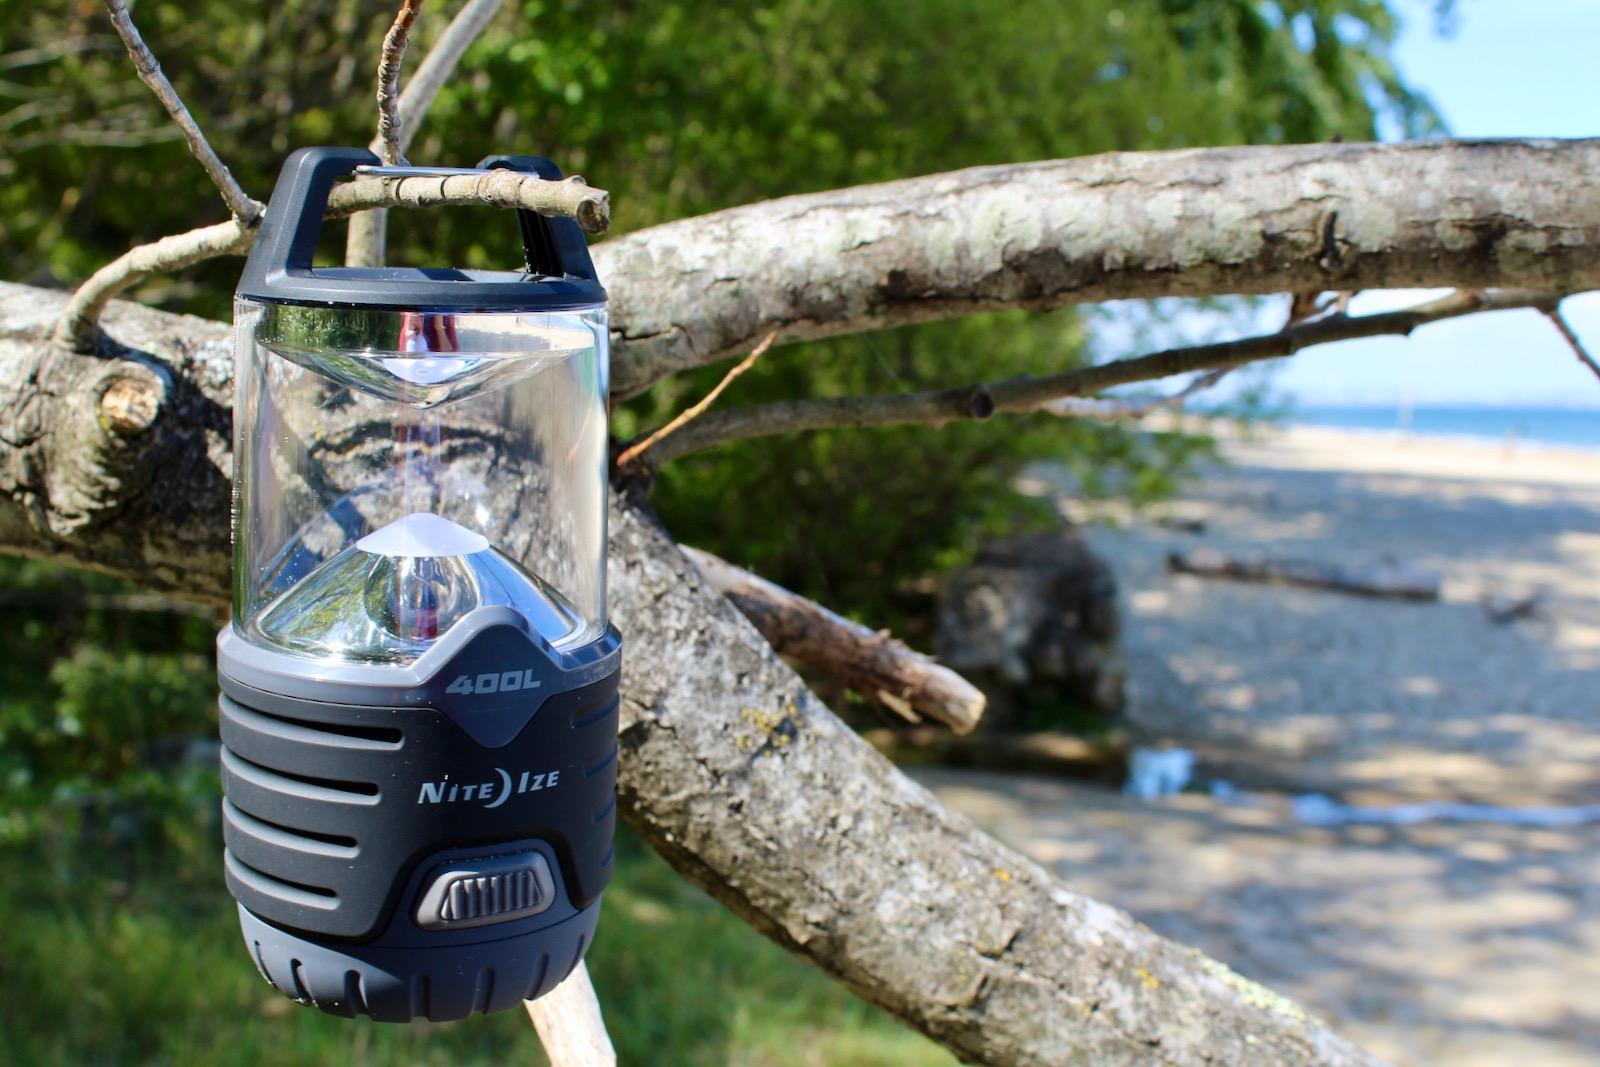 NiteIze Radiant 400 LED Outdoor Camping Lantern